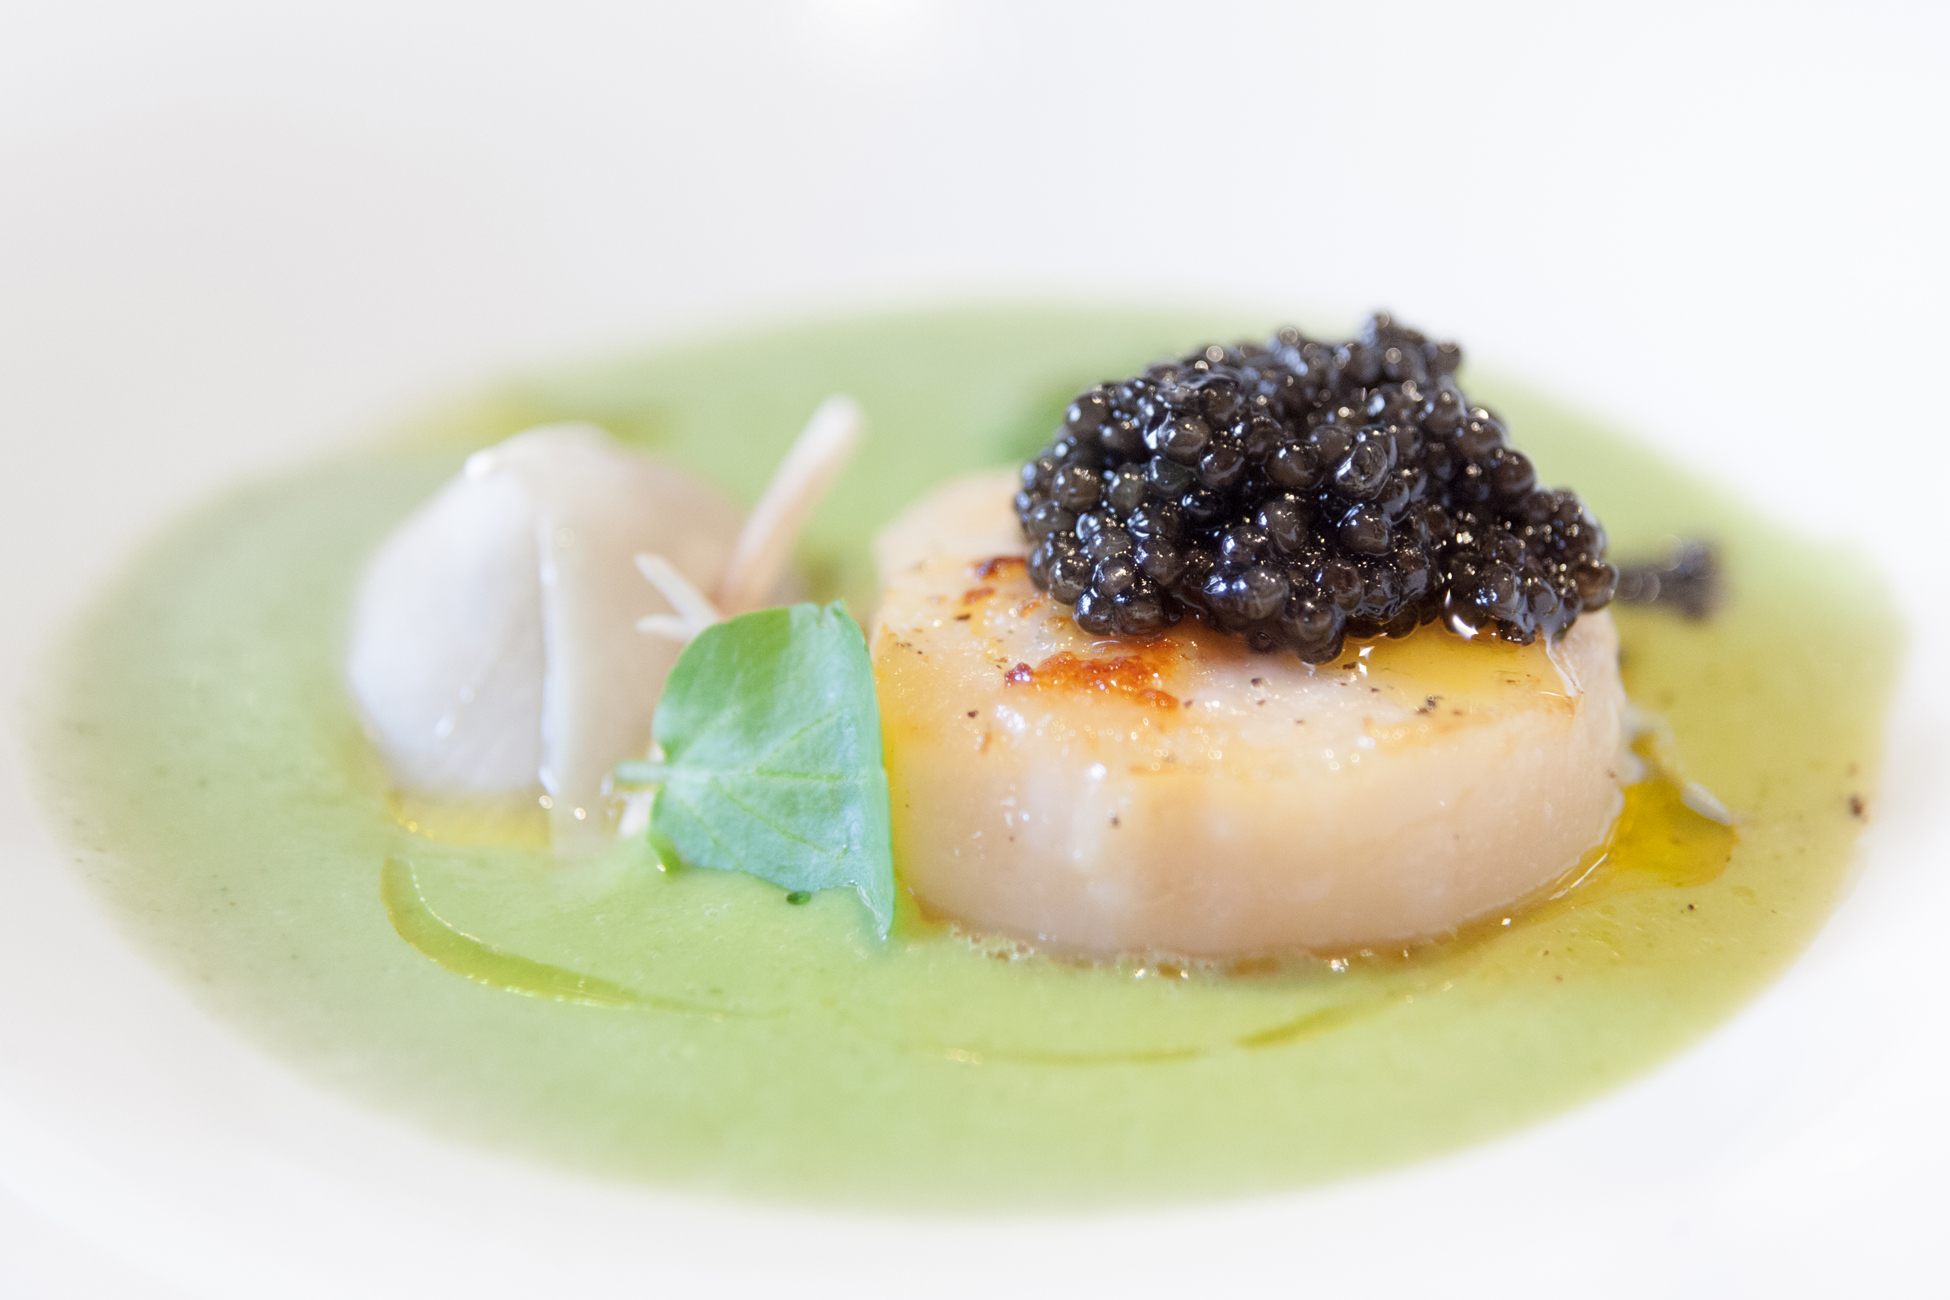 caviar-akitania-aquitaine-sturgeon-copyright-maeva-destombes-8436